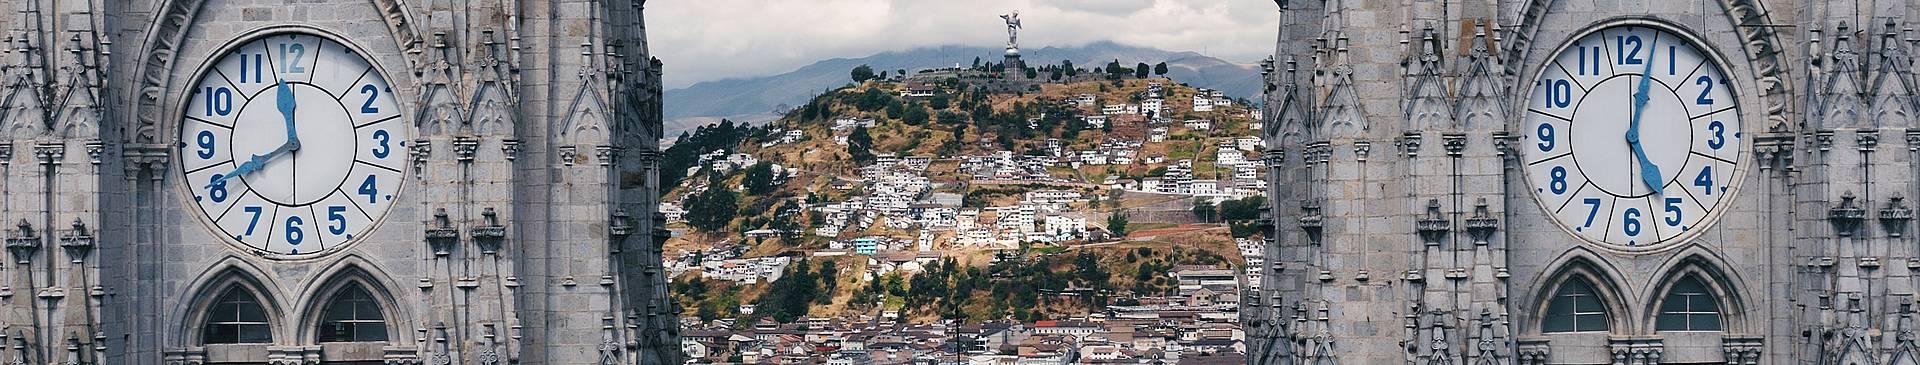 Eine Woche nach Ecuador